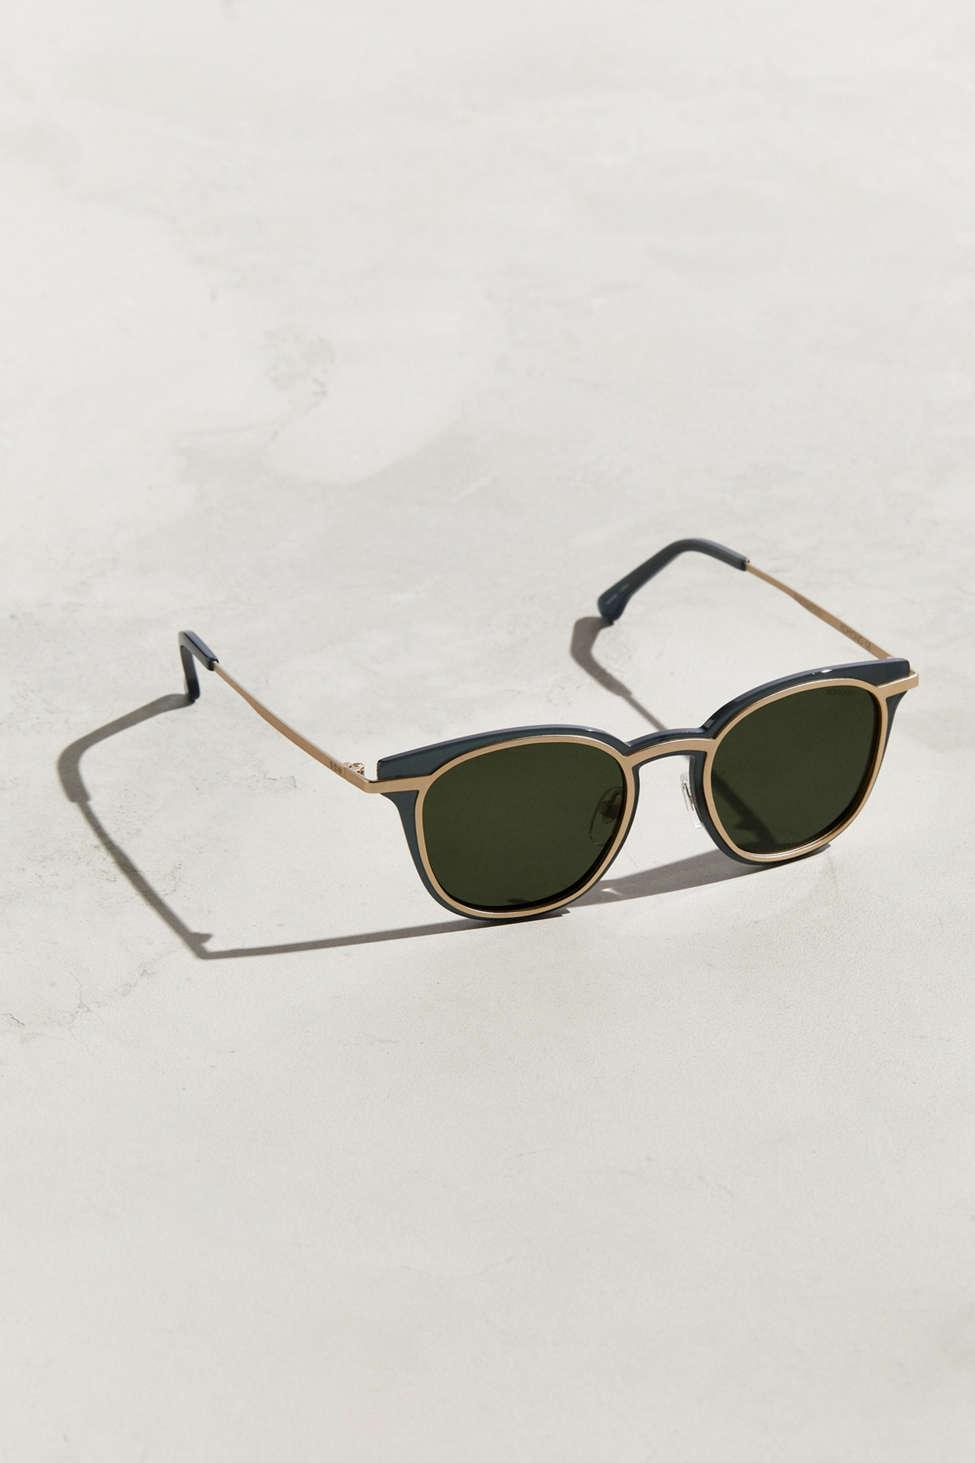 Komono Sydney Sunglasses in Green for Men - Lyst